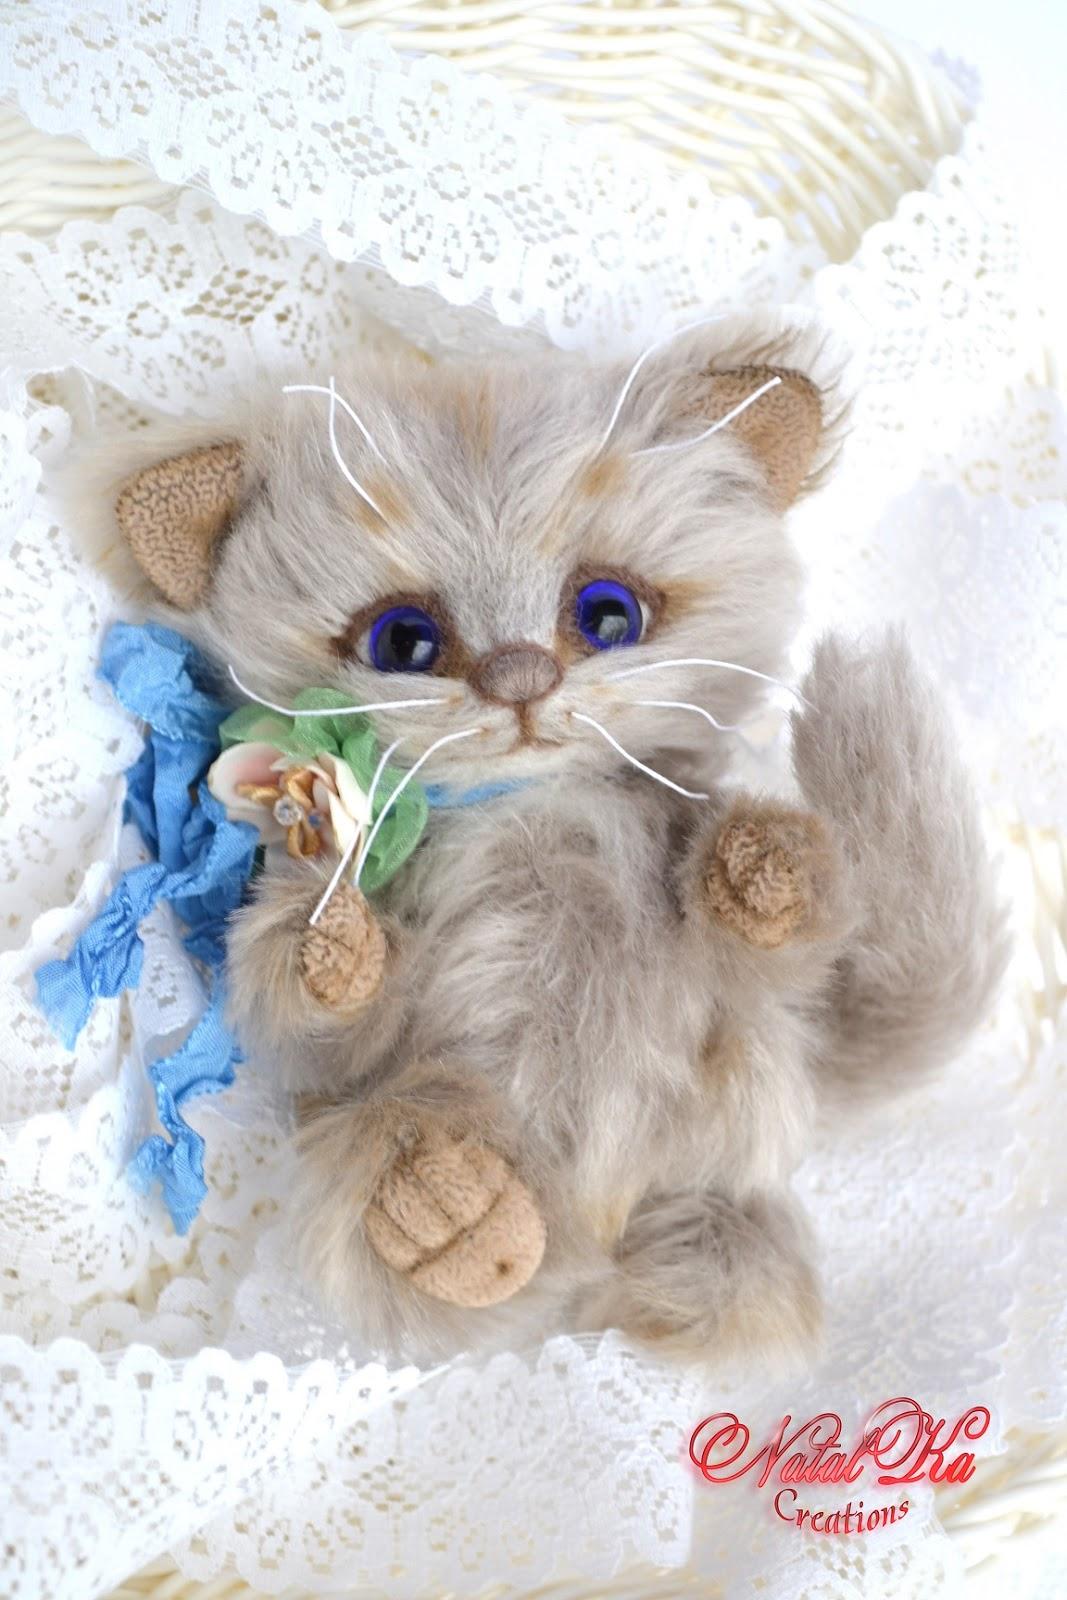 Авторский котенок, кот тедди, мишка тедди, авторская игрушка, ручная работа от NatalKa Creations. Artist teddy kitty, teddy bear, artist cat, ooak, jointed, teddies with charm, handmade by NatalKa Creations. Künstlerteddy Kätzchen, Katze, Künstlerbär, Teddybär, Unikat, Mohair, handgemacht von NatalKa Creations.